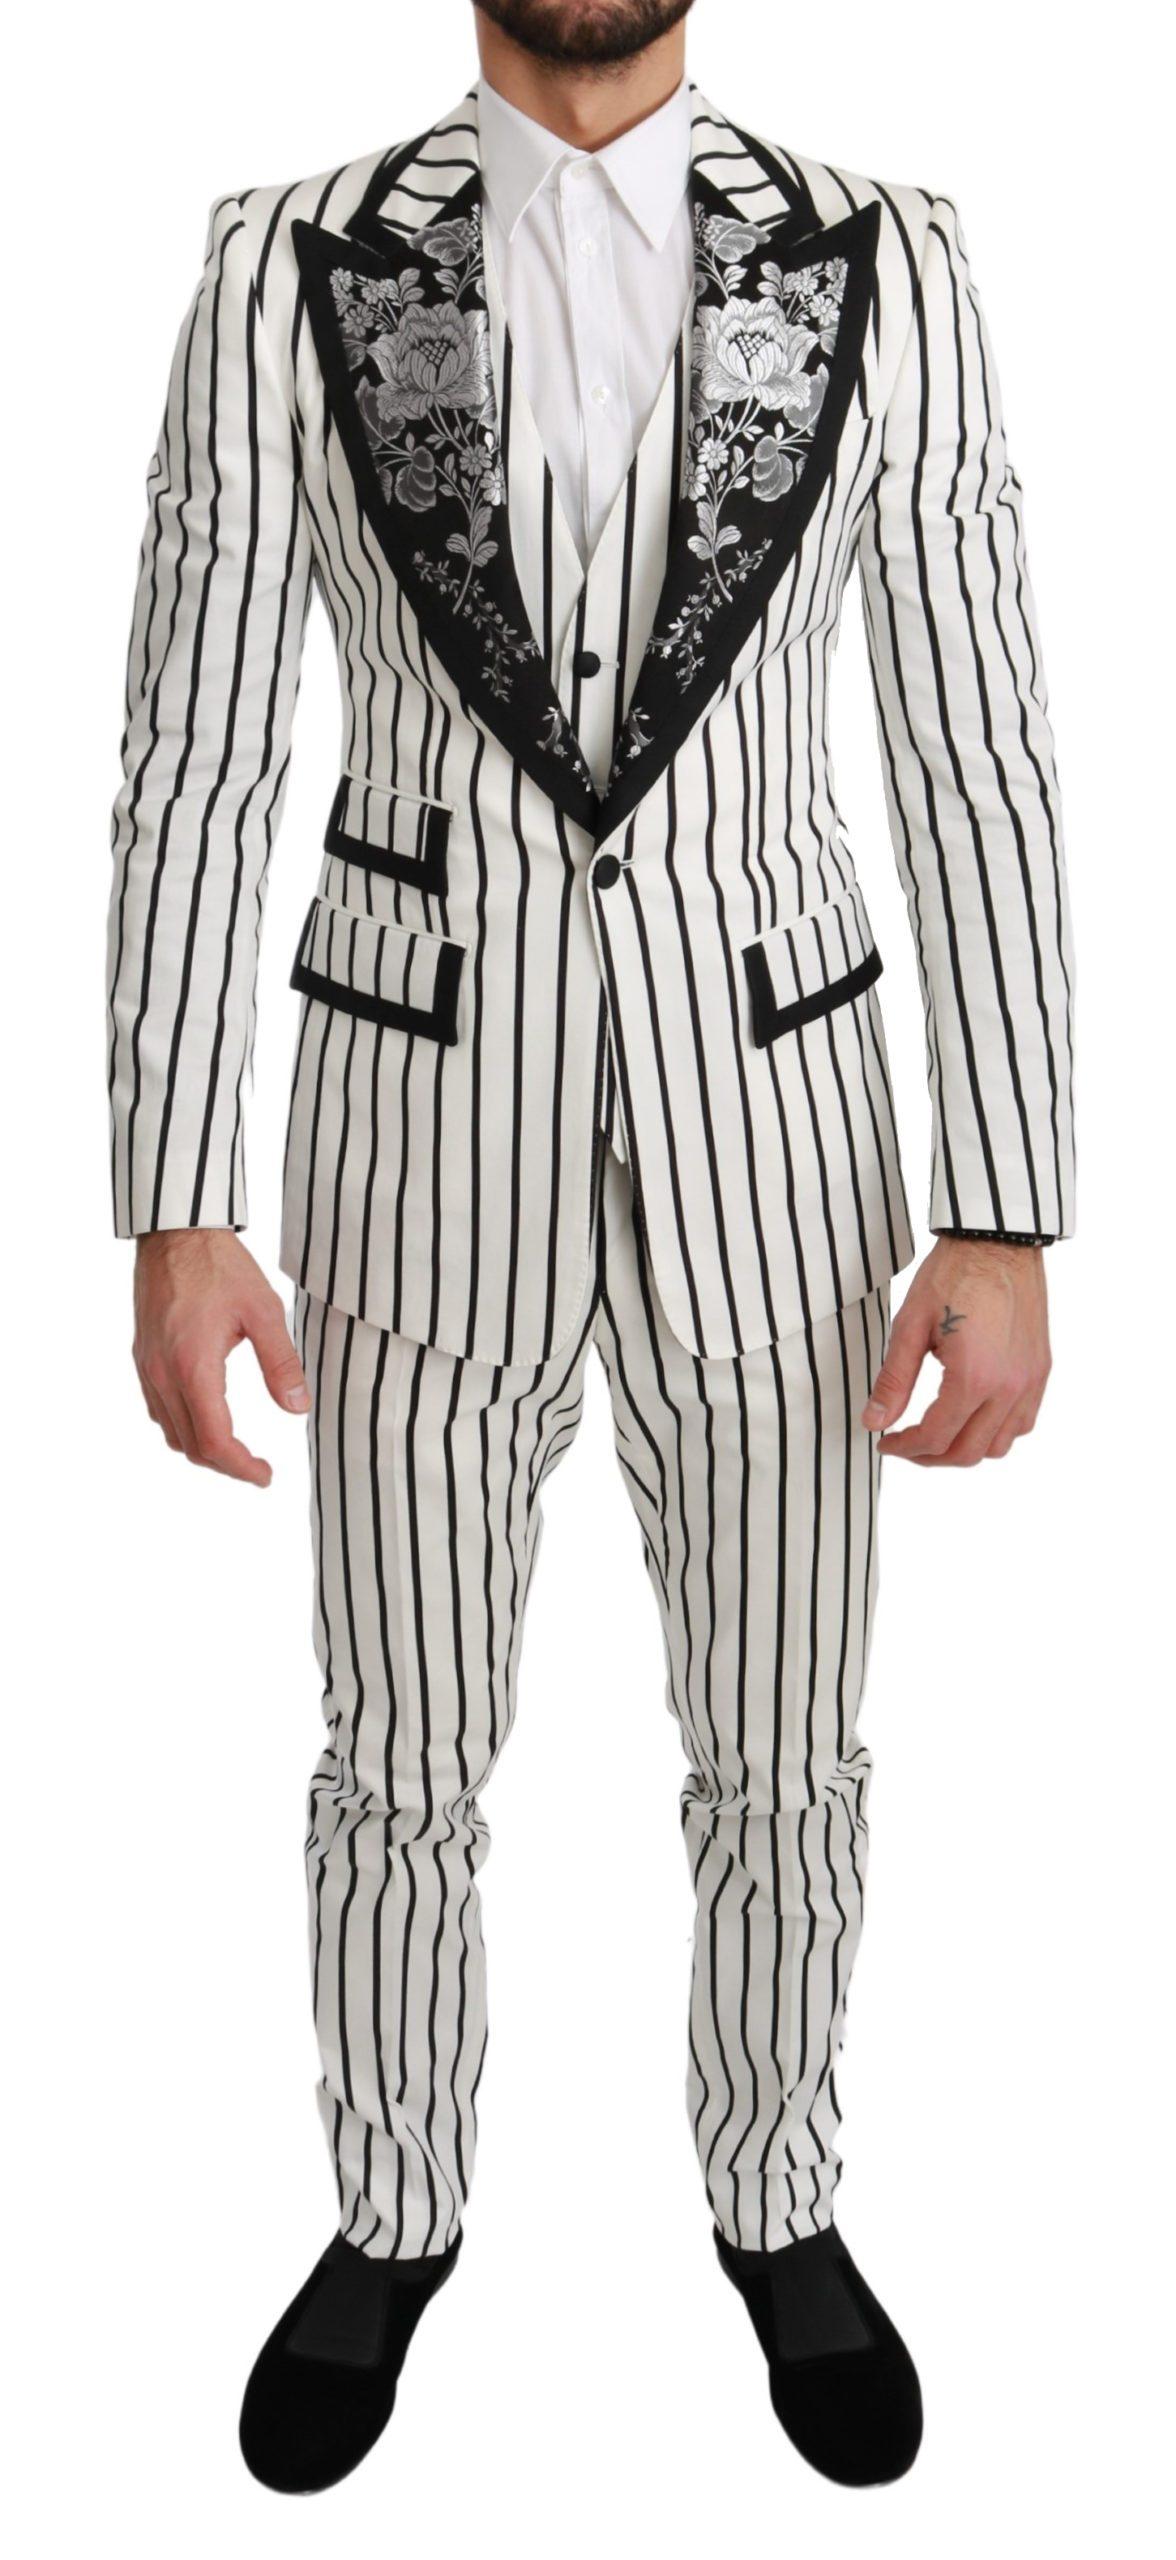 Dolce & Gabbana Men's Striped Floral 3 Piece White Suit White KOS1702 - IT46 | S